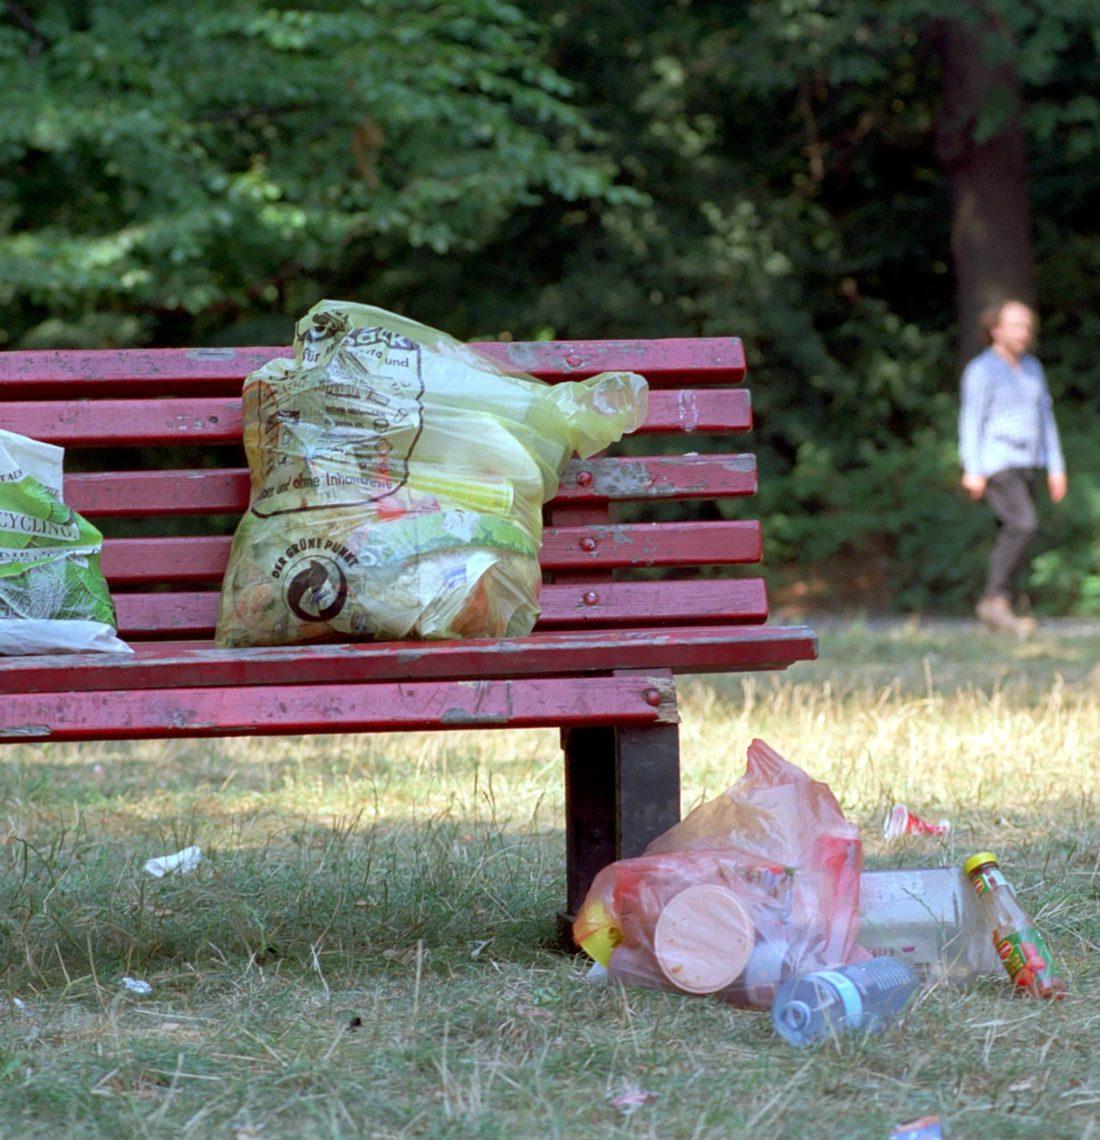 Berlin hasenheide sex im park Berlin Hasenheide: